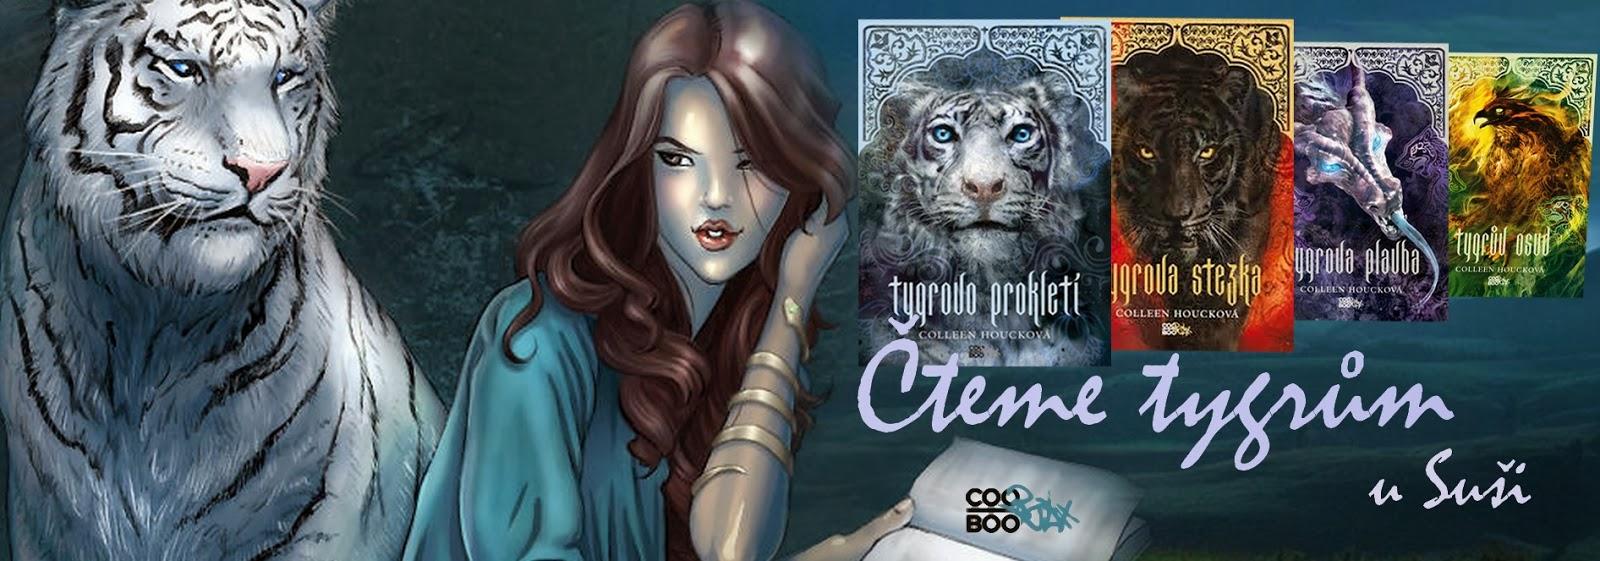 http://dreams-aboutbooks.blogspot.cz/2014/02/cteme-tygrum-uvod.html